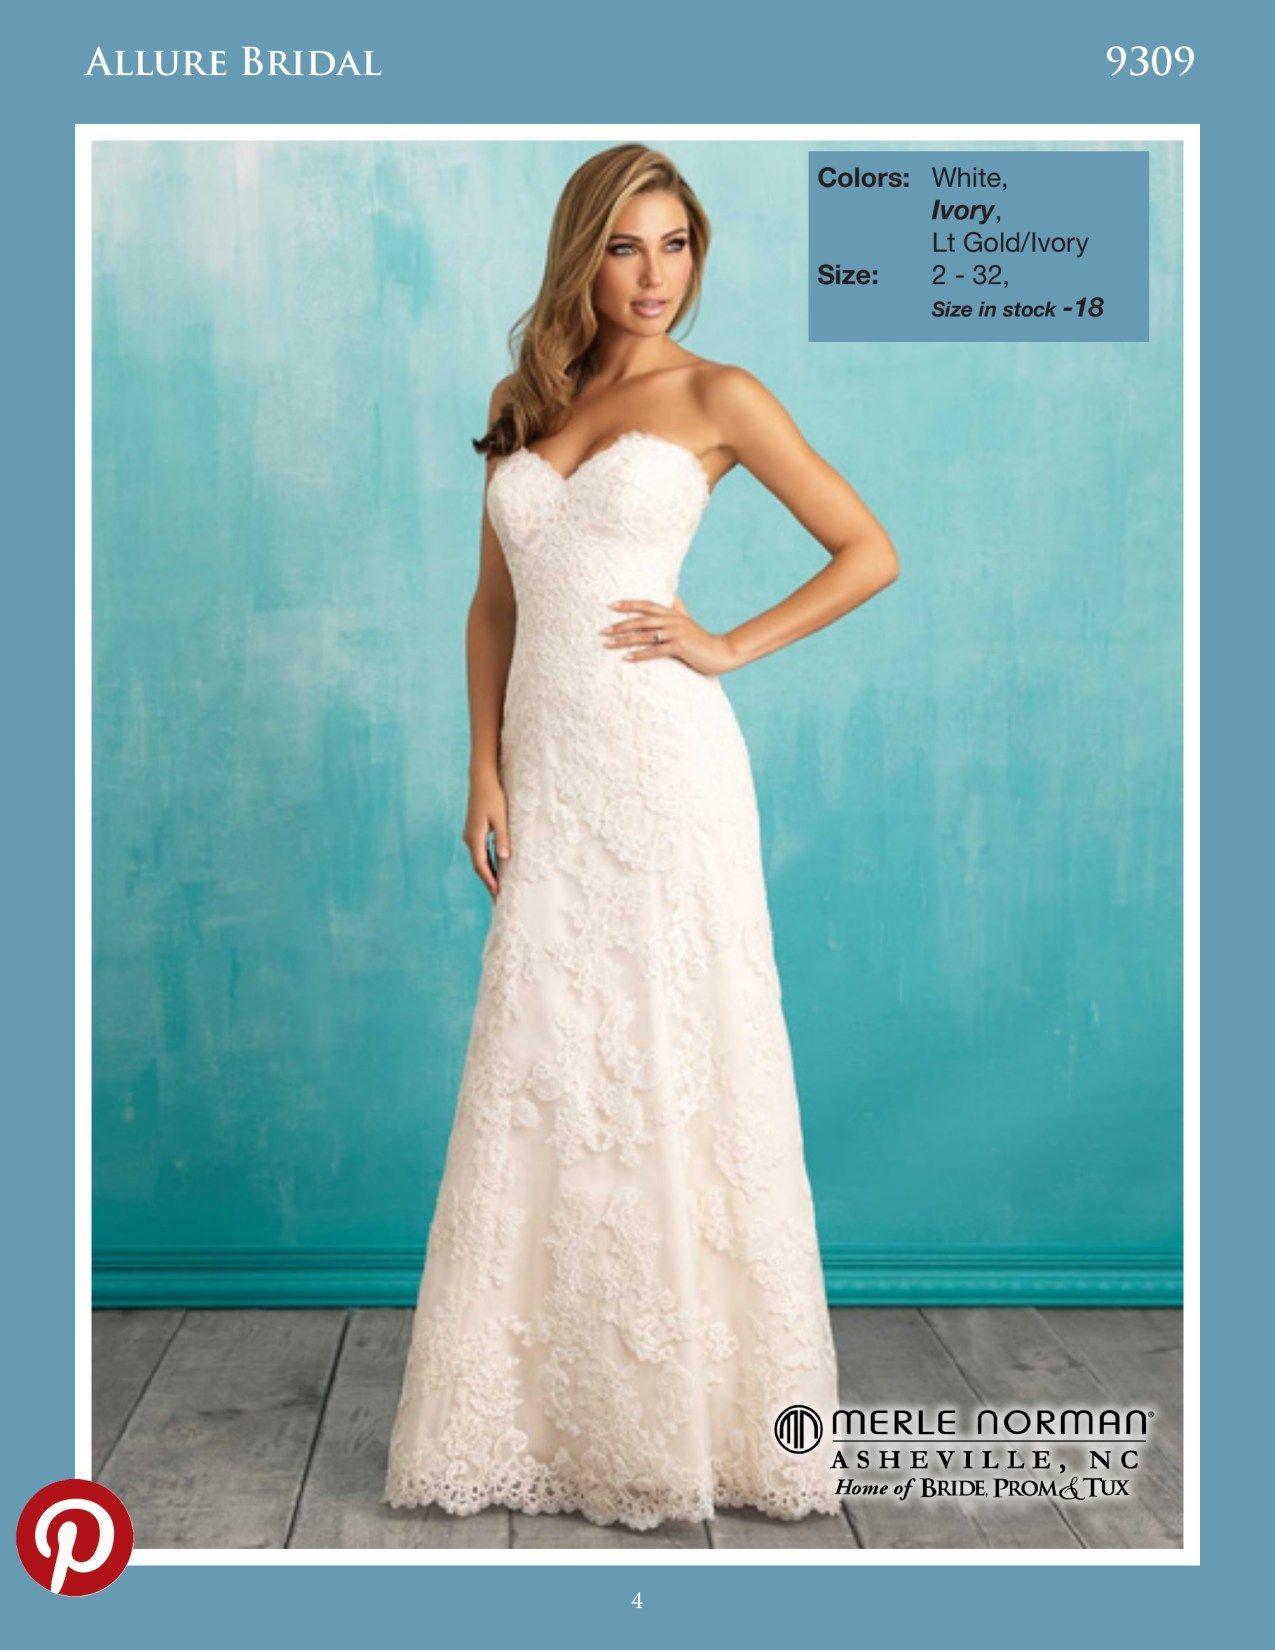 Allure 9309 | Allure Bridals | Pinterest | Prom tux and Allure bridal